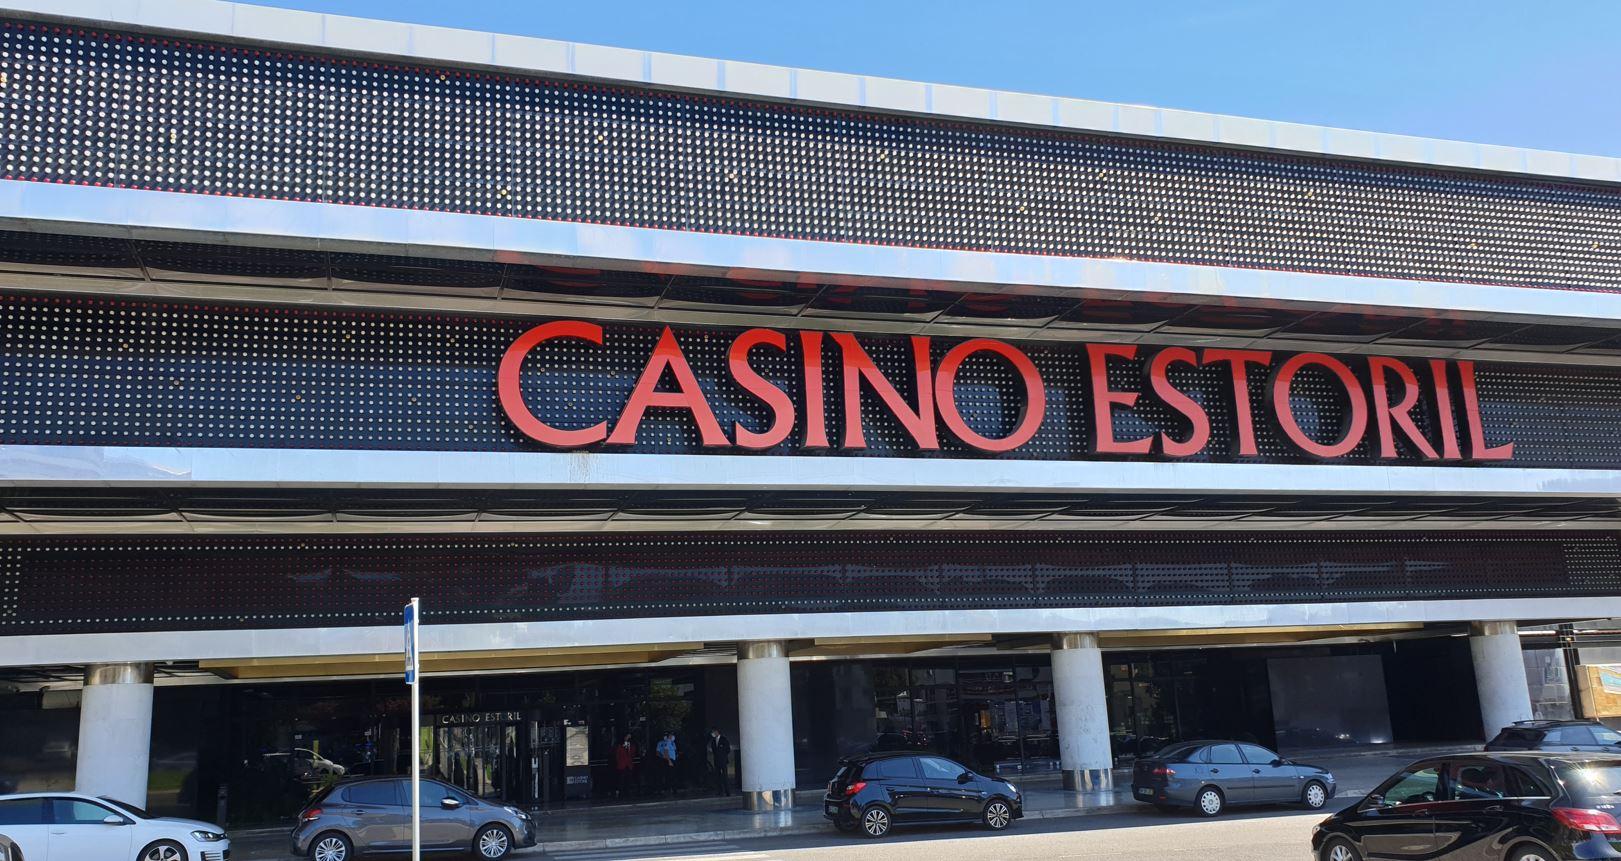 Casino Estoril in Portugal